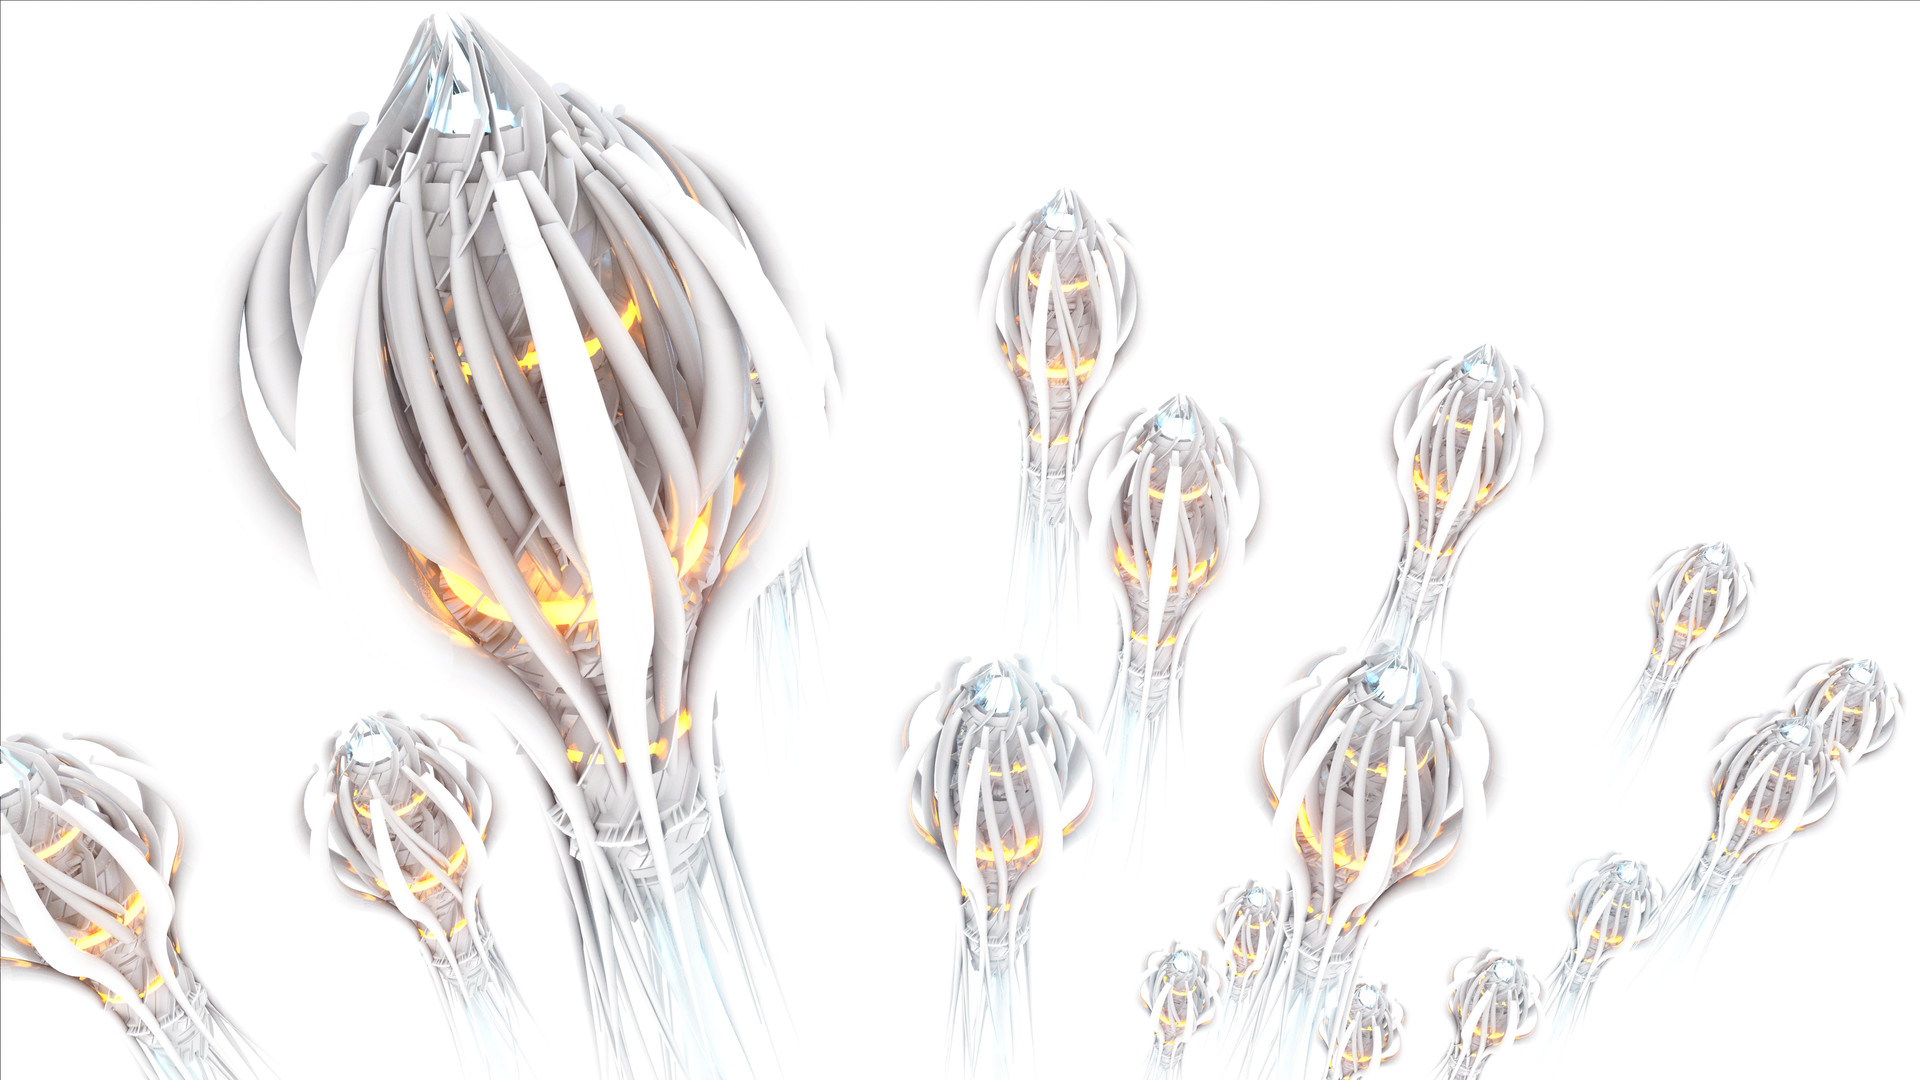 Kresimir jelusic robob3ar 242 110616 swarm ao2